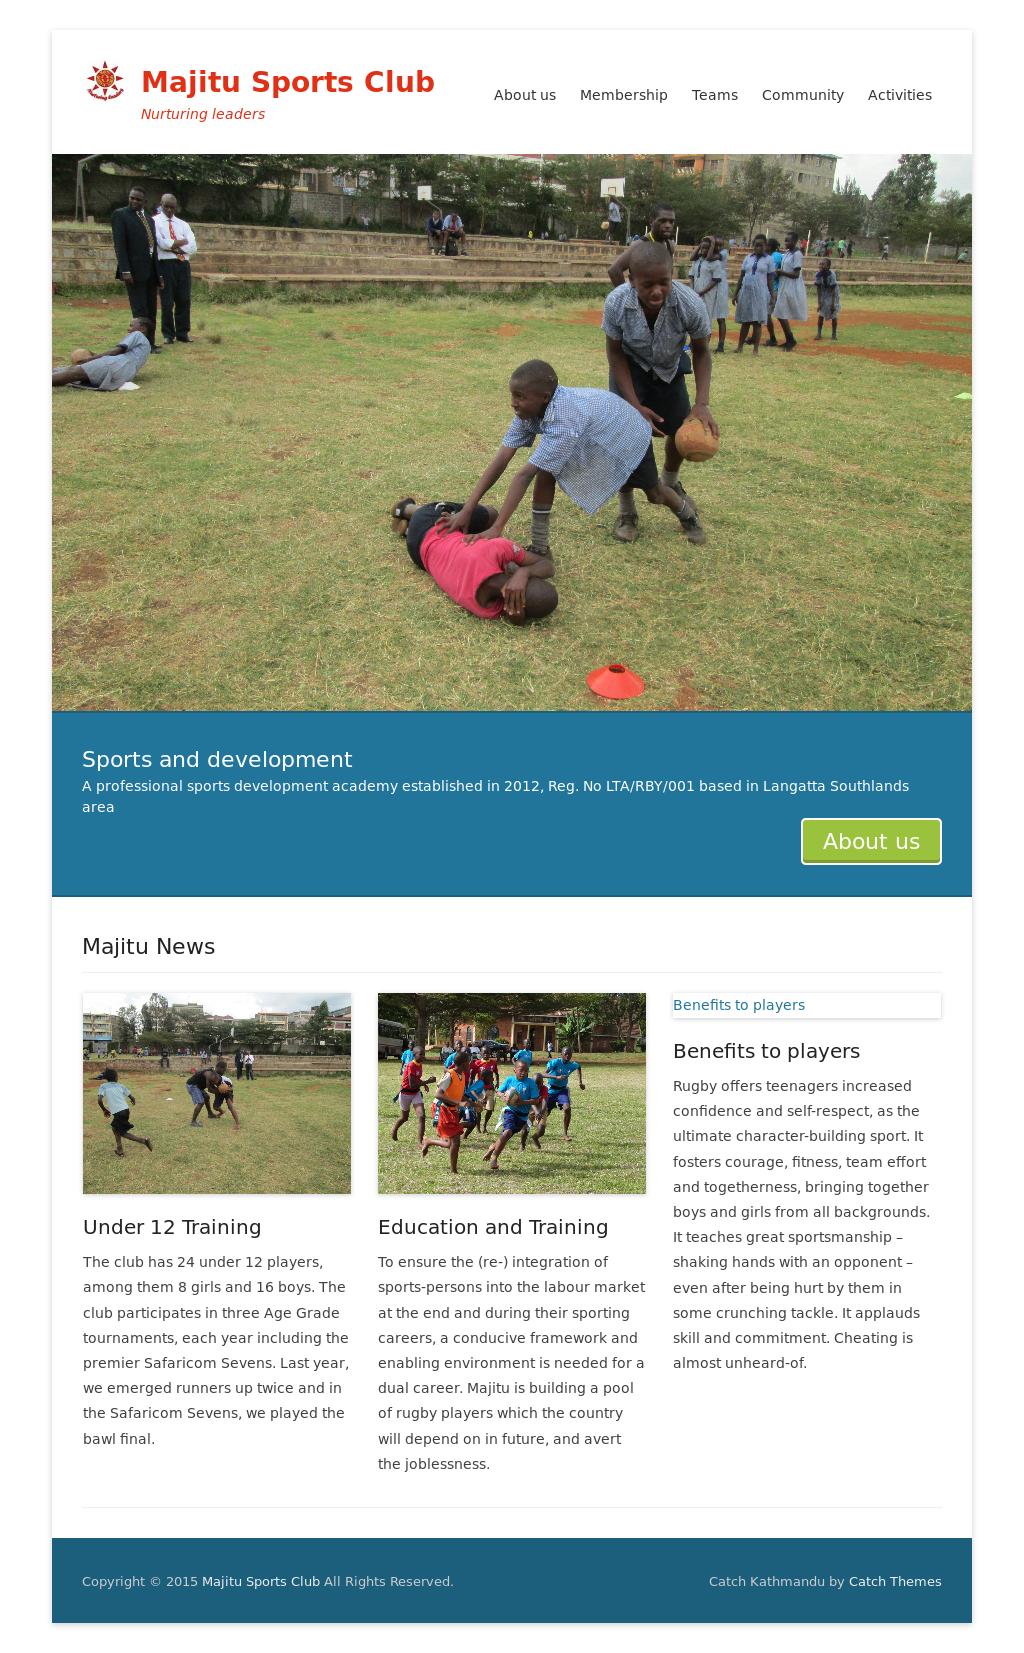 Majitu Sports Club Competitors, Revenue and Employees - Owler